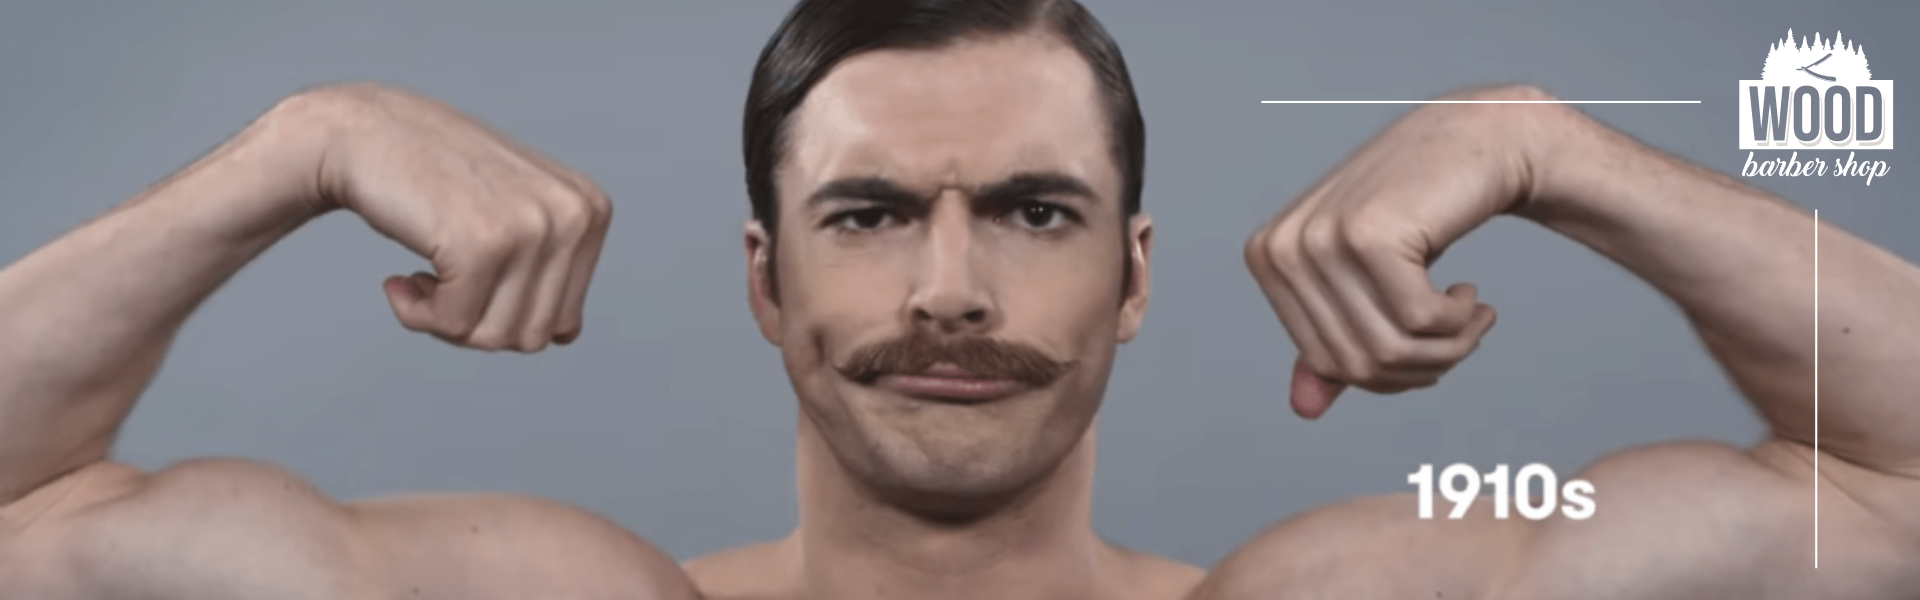 taglio dei baffi nel 1900